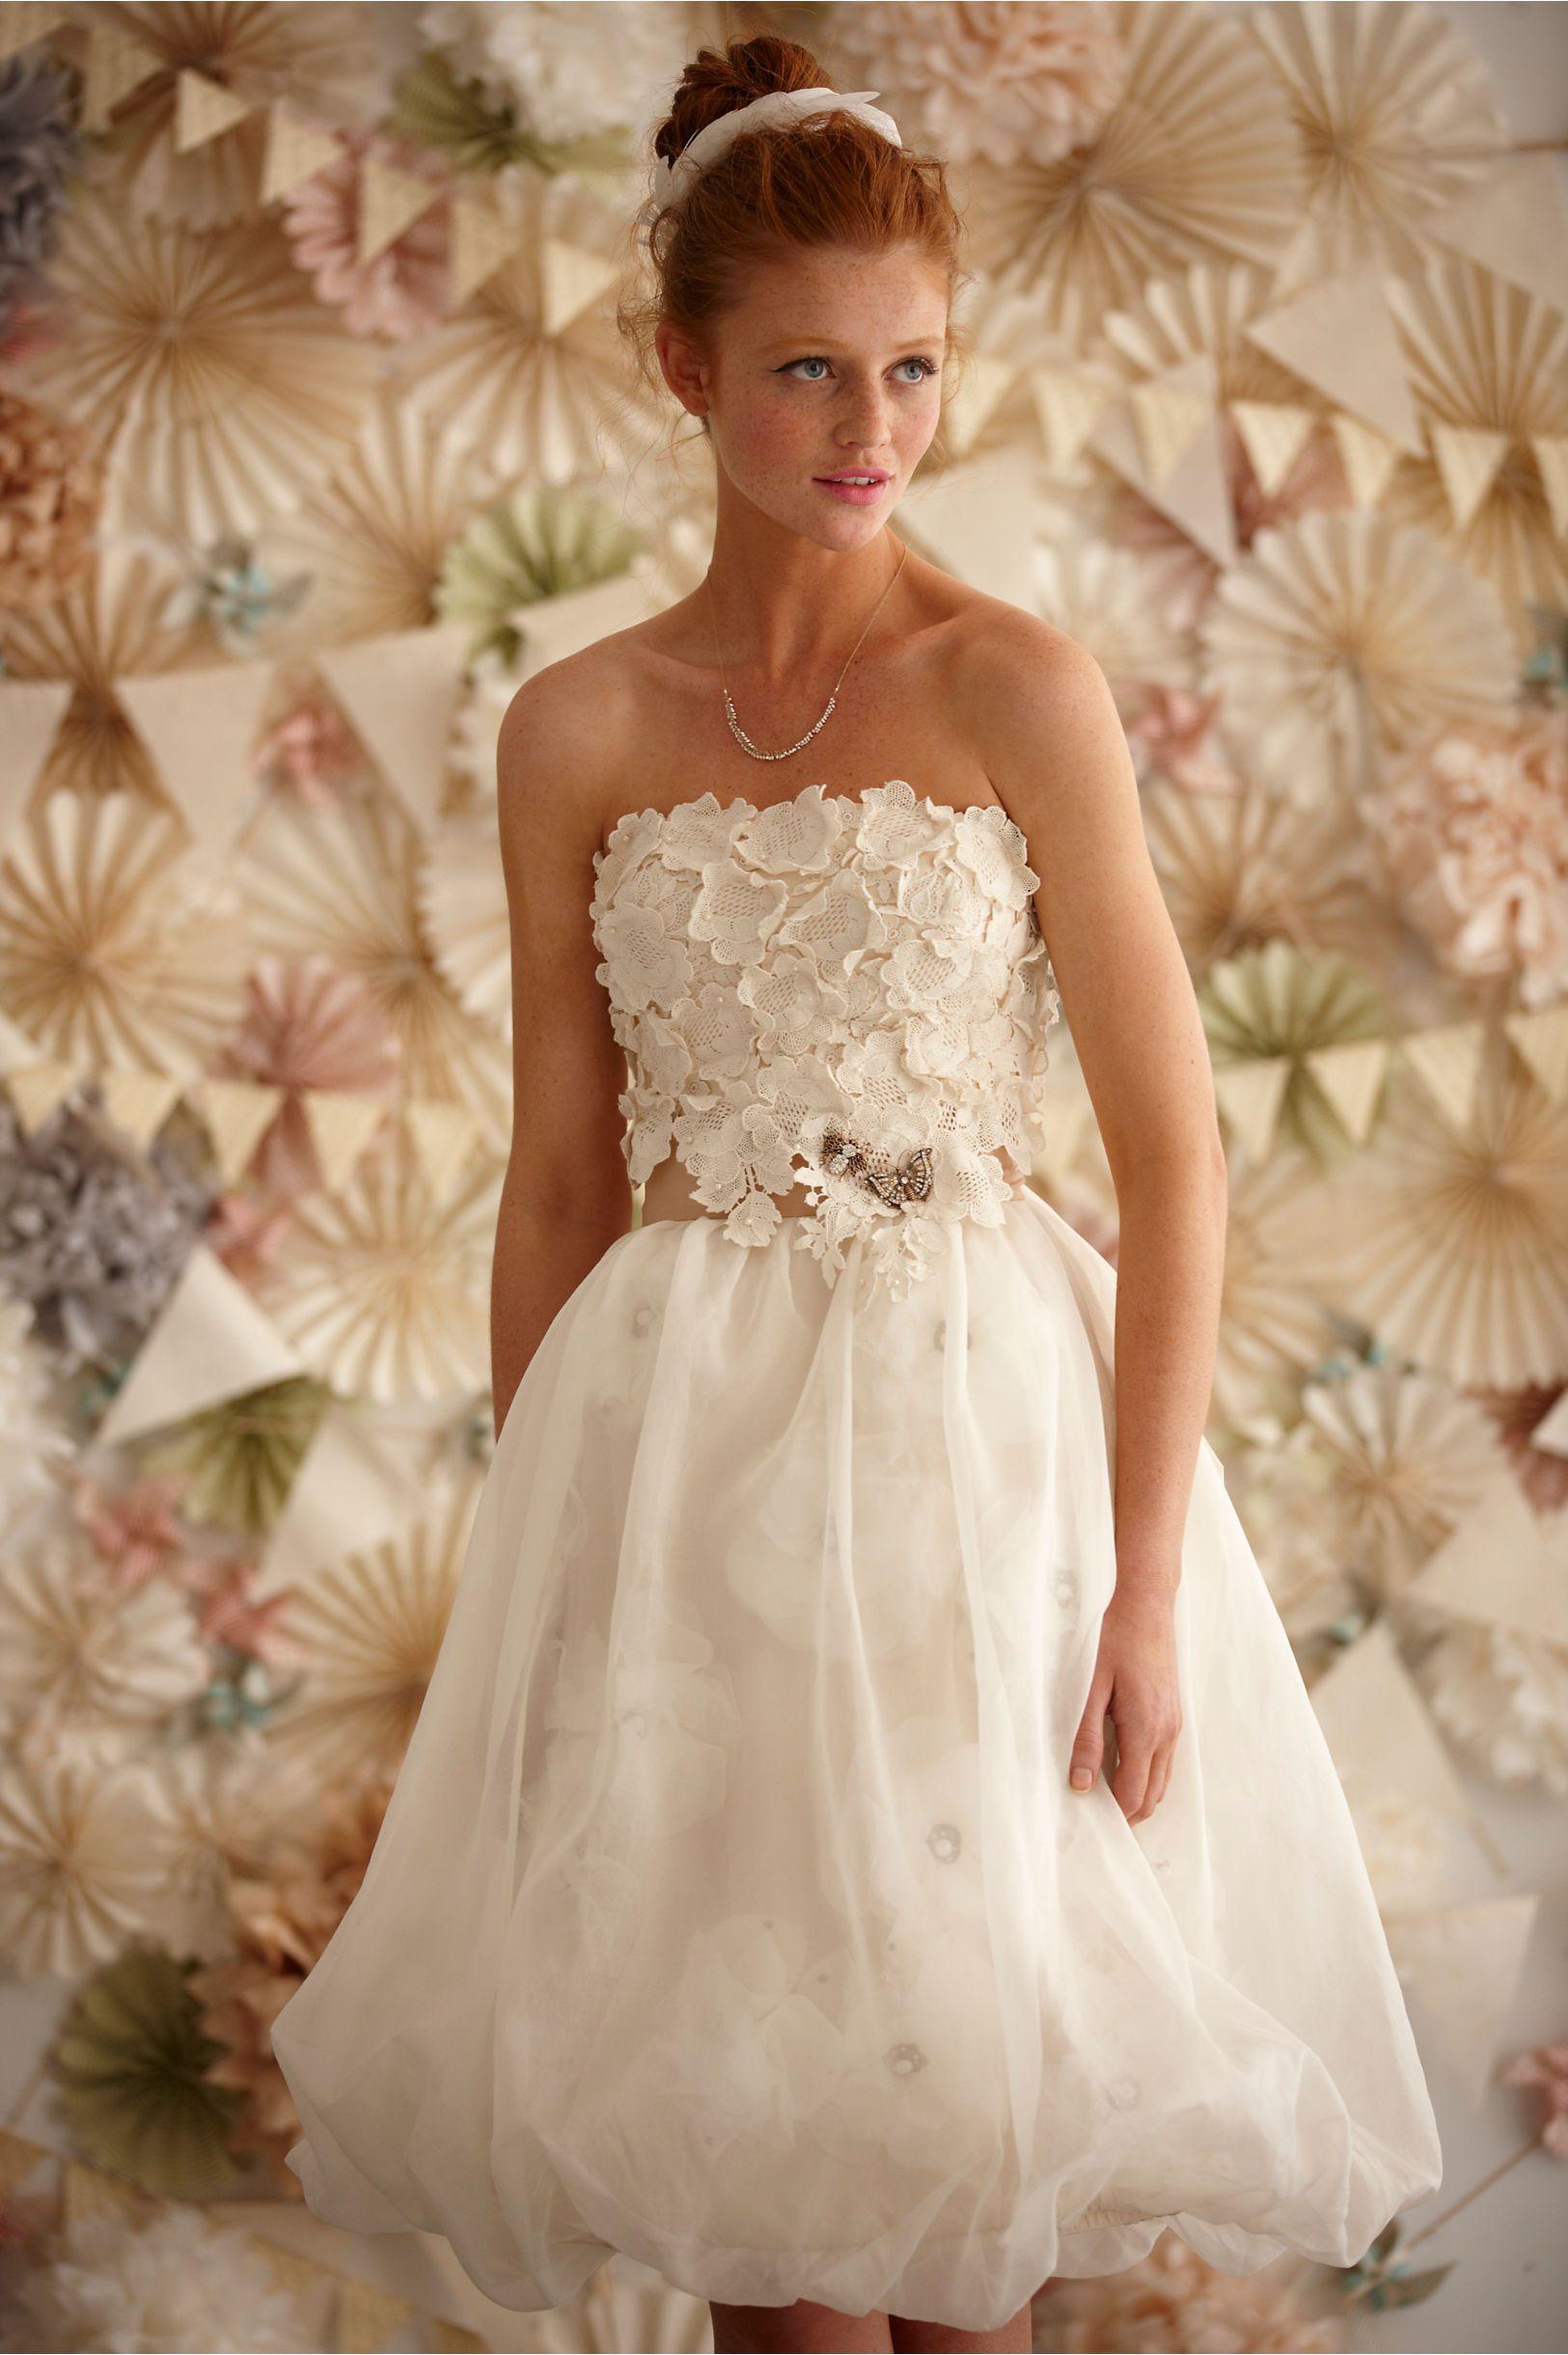 Bhldn bhldn quillaree floral art dress size 0 wedding dress bhldn bhldn quillaree floral art dress size 0 wedding dress ombrellifo Choice Image